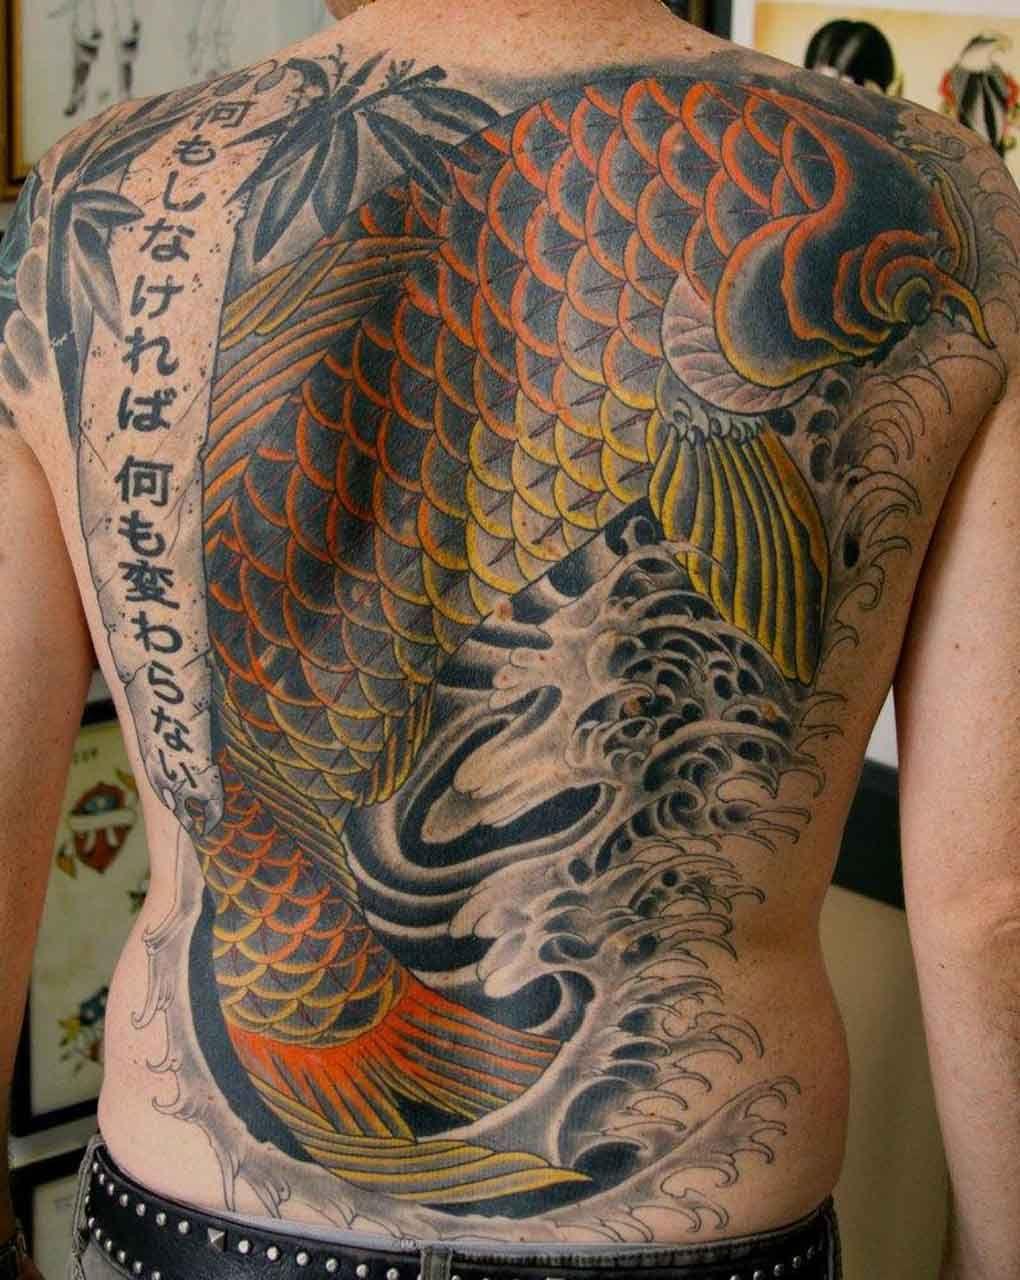 Animal Beautiful Koi Fish Tattoo For Your Inspiration Japanese Tattoo Japanese Water Tattoos Koi Japanese Tattoo Designs Tattoos For Guys Koi Tattoo Design